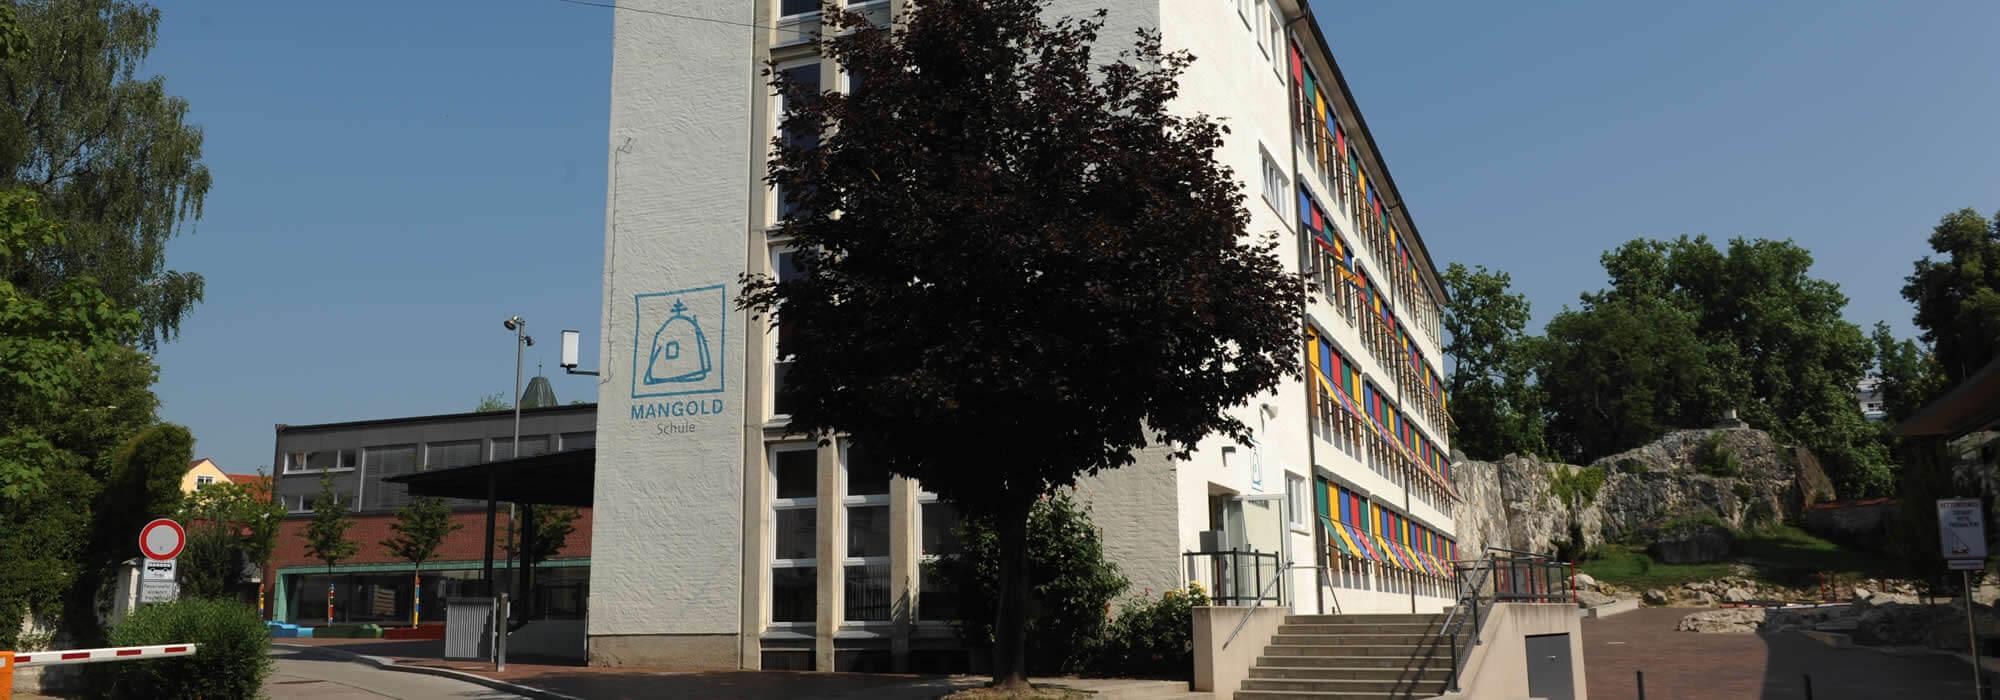 Mangold-Grundschule